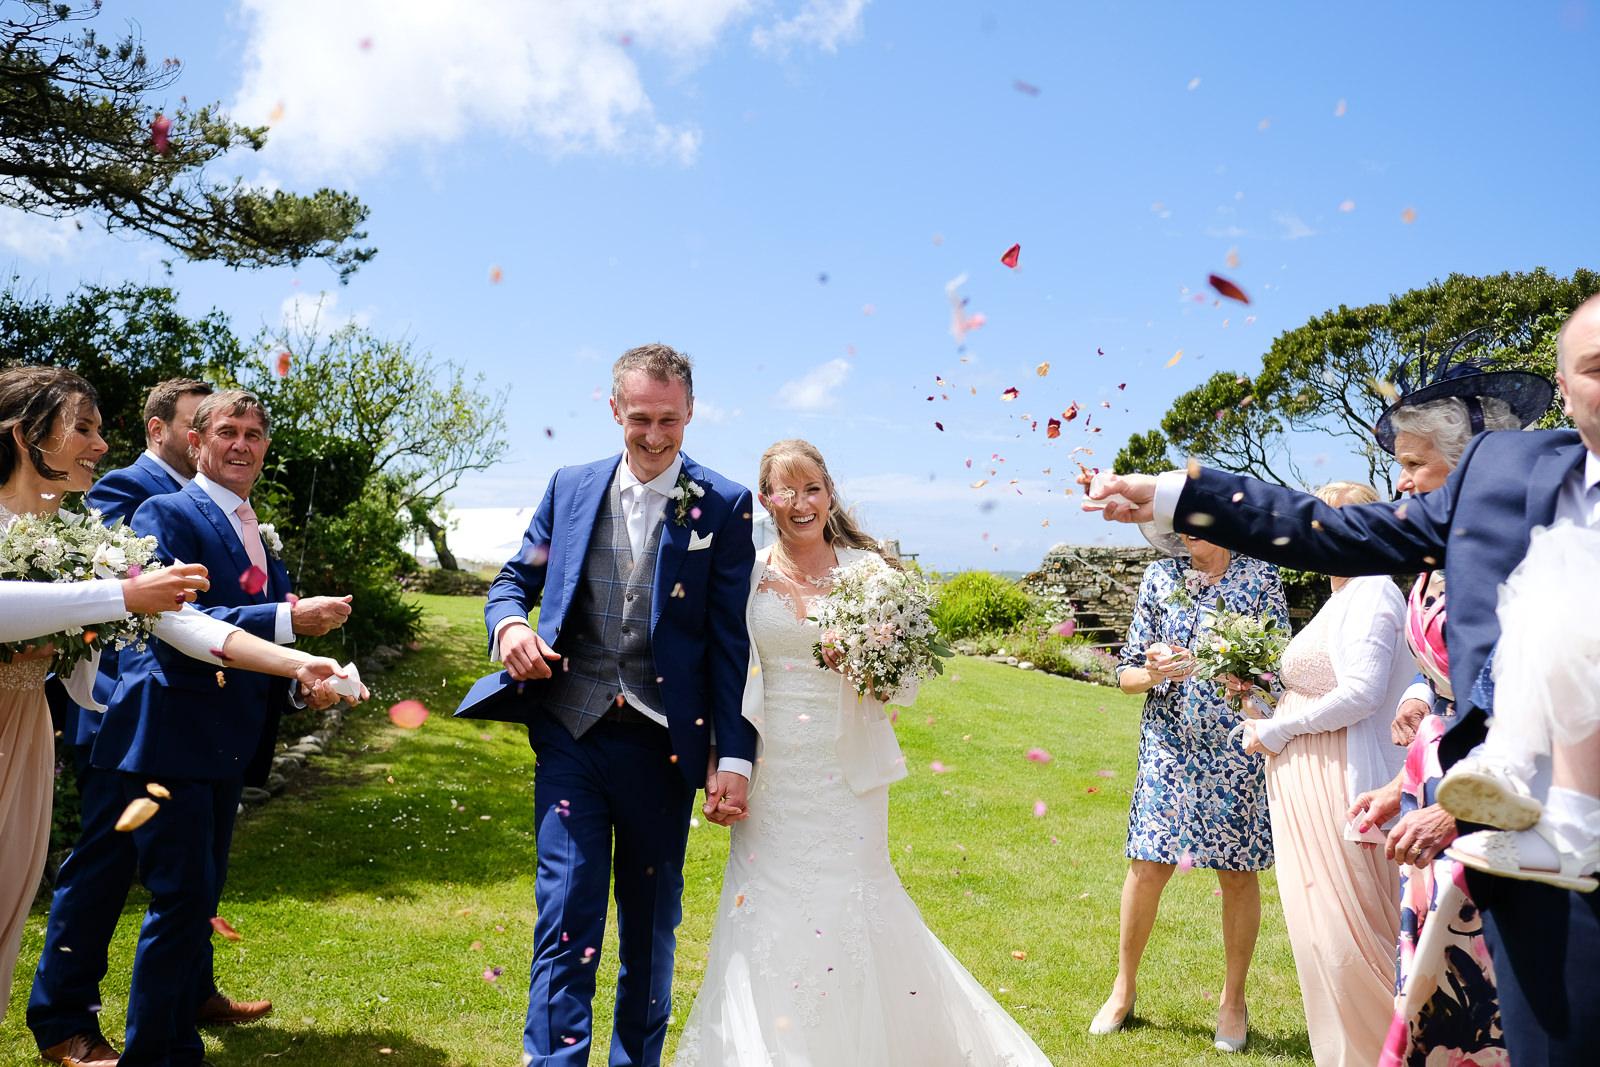 Roscarrock Farm wedding in Cornwall 038.jpg